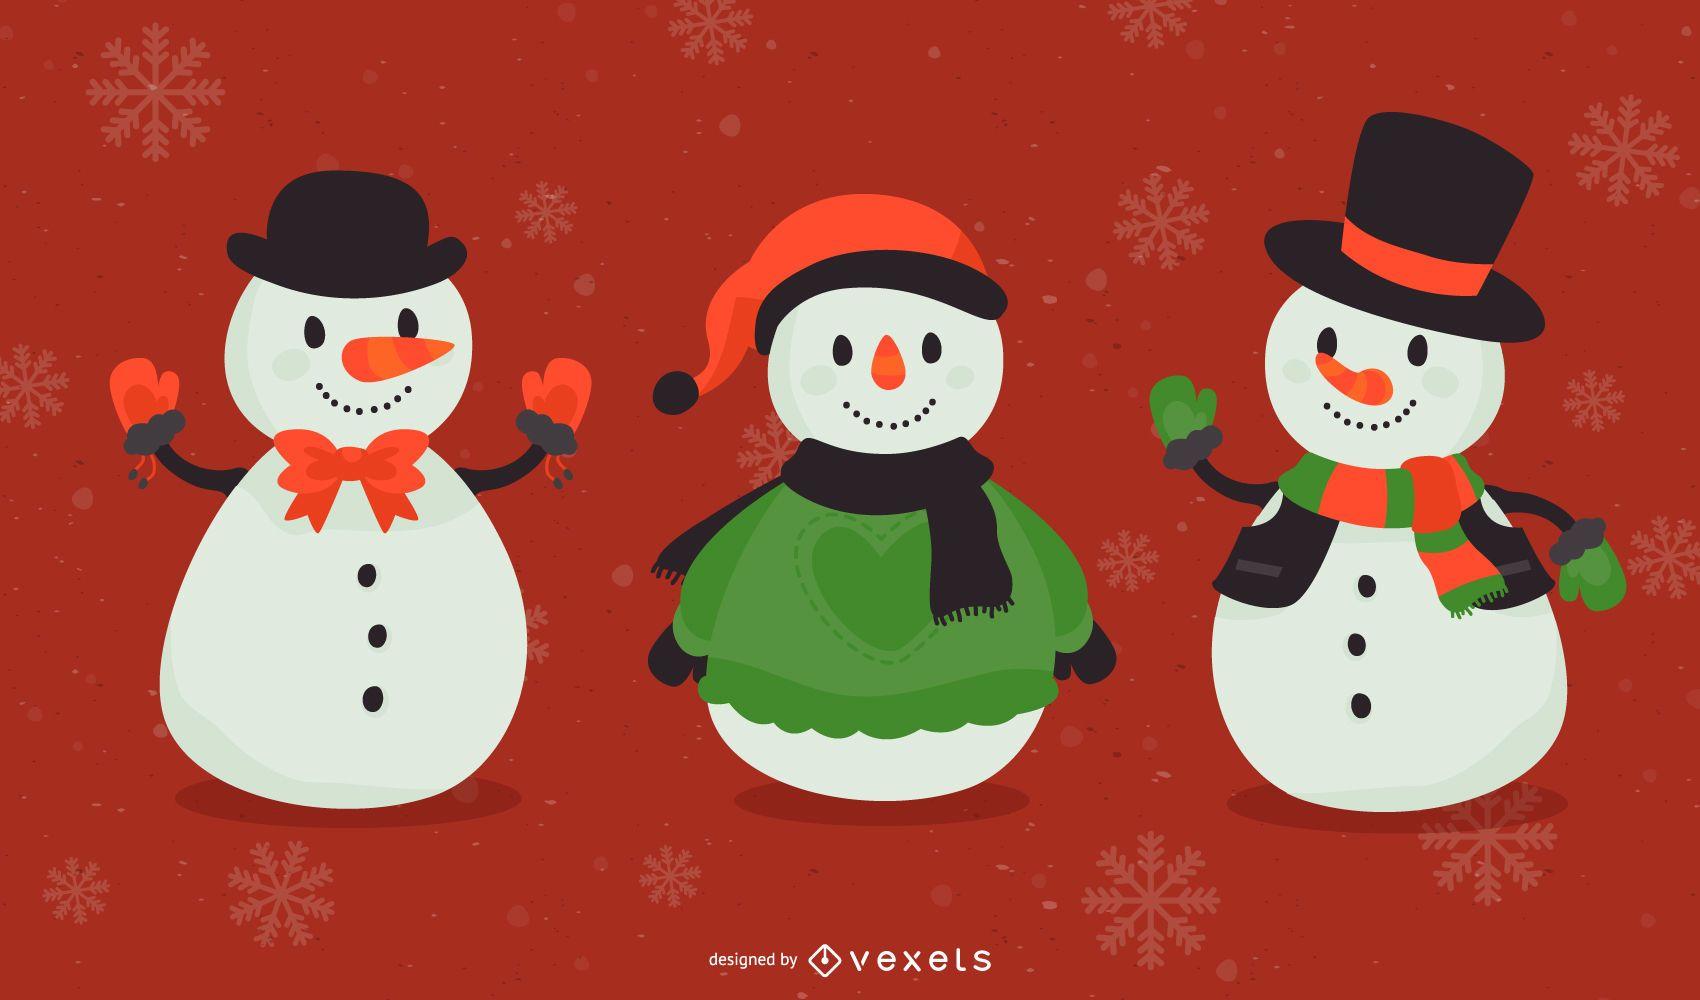 Frosty Snowman Vectors